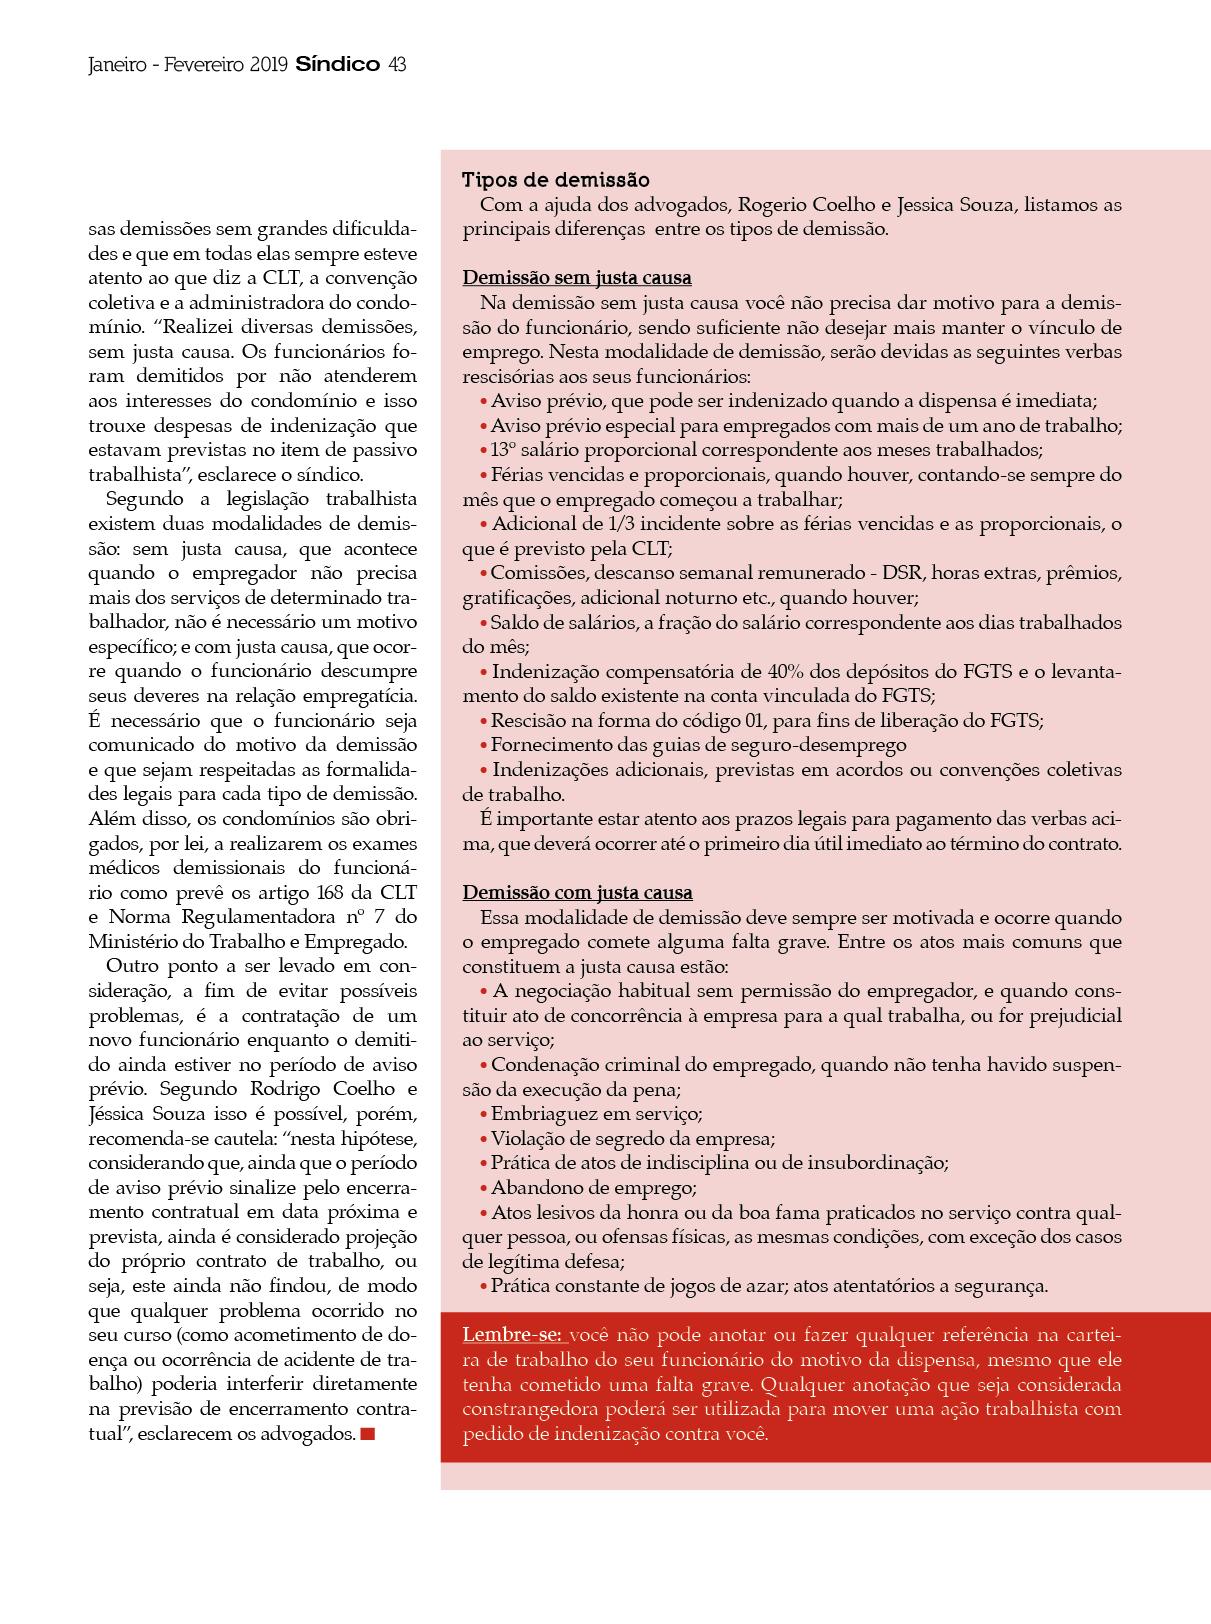 Revista Síndico_ed 242_41